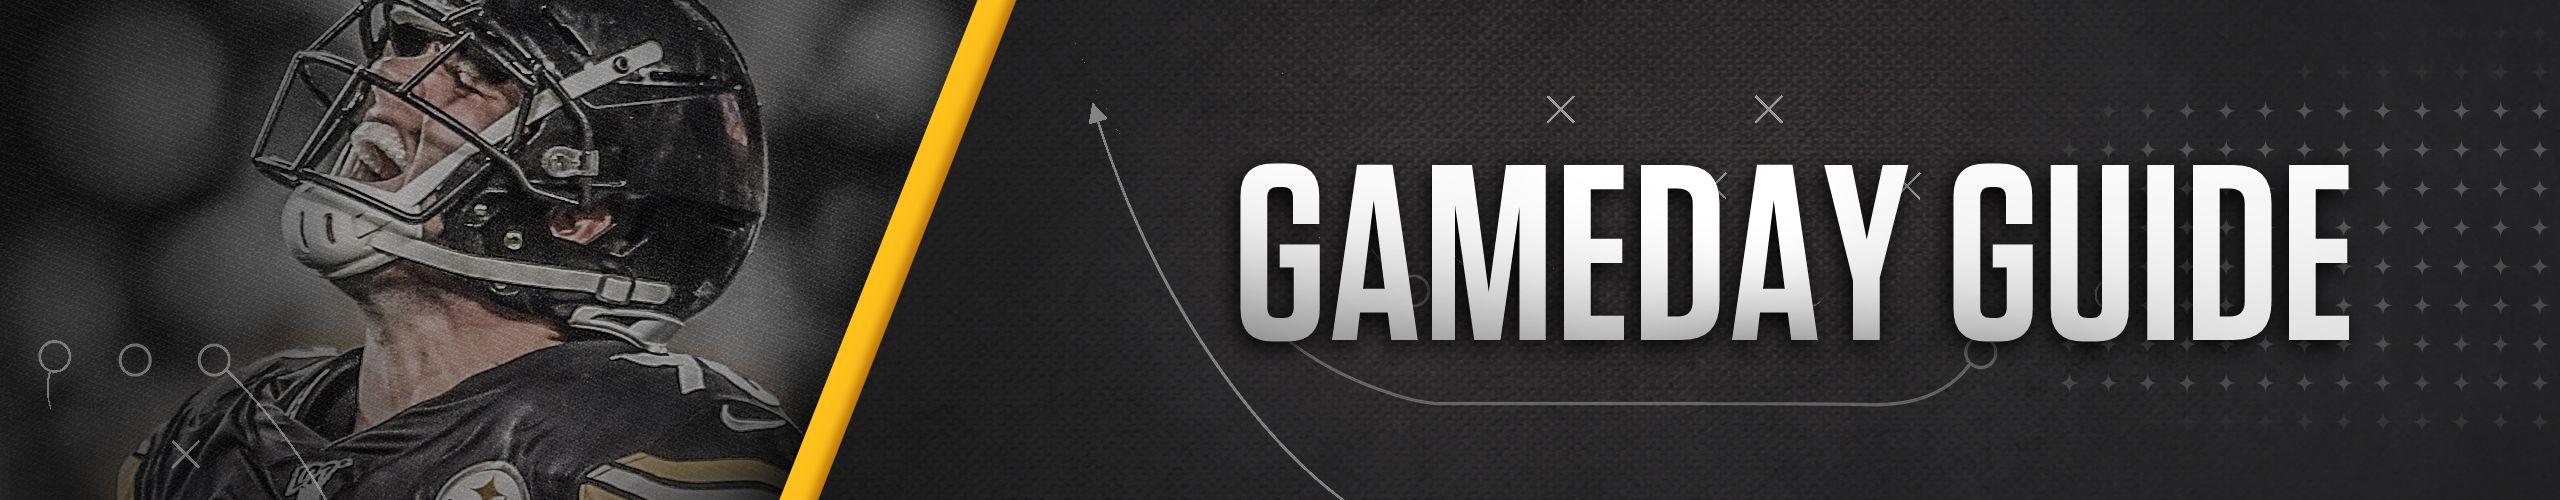 GamedayGuide_Header